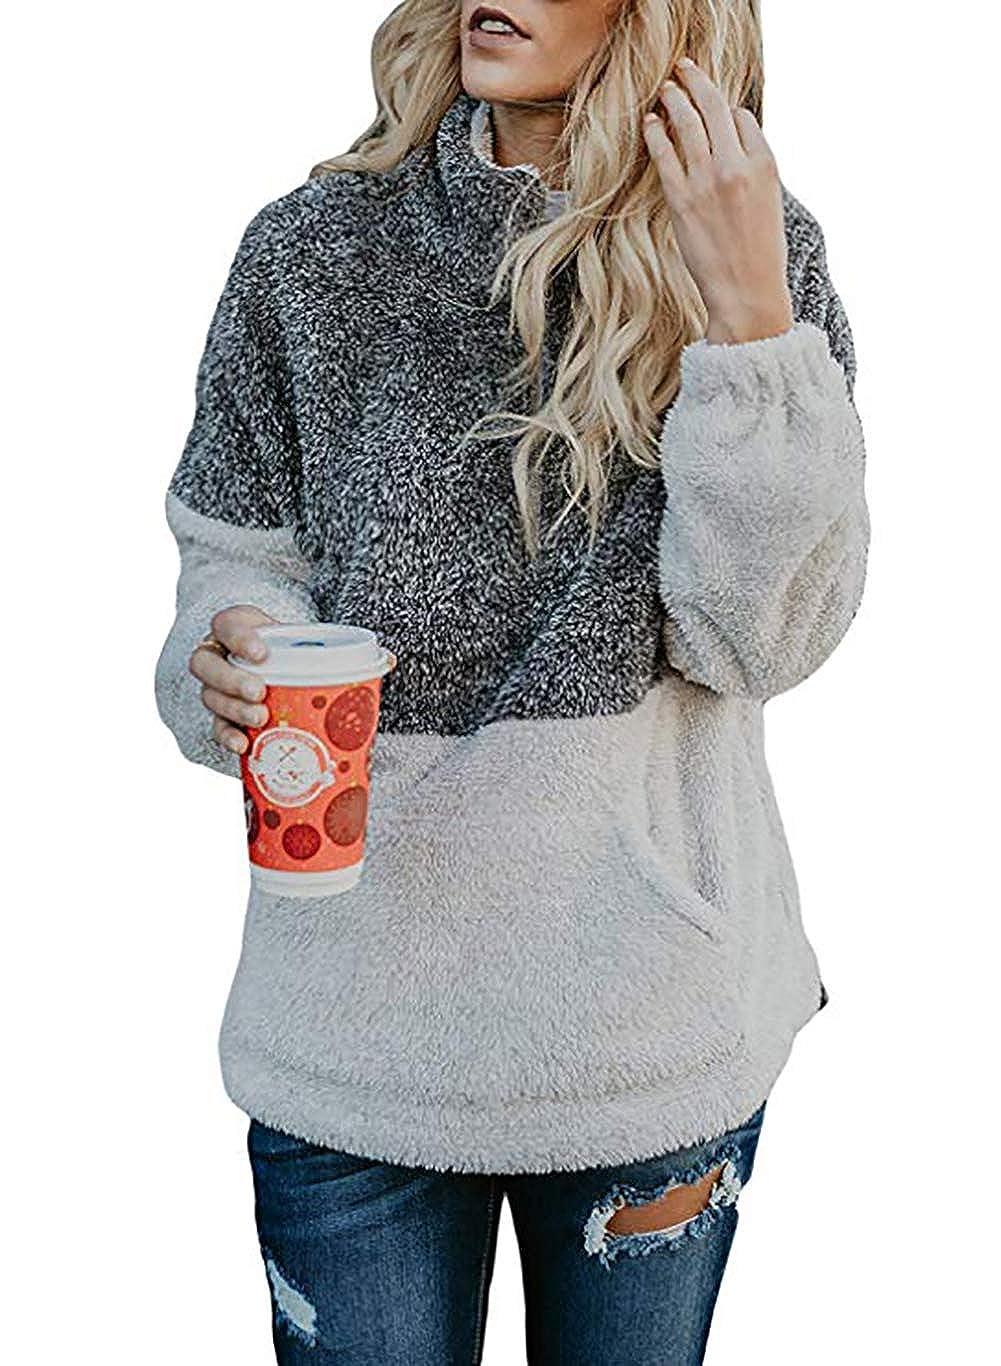 9daeea60d67 Features  Long Sleeve 1 4 Zipper Long Length High Collar Stand  Collar Pocket Contrast Color Sherpa Fleece Pullover Sweater Sweatshirts  Outwear Jacket Coat